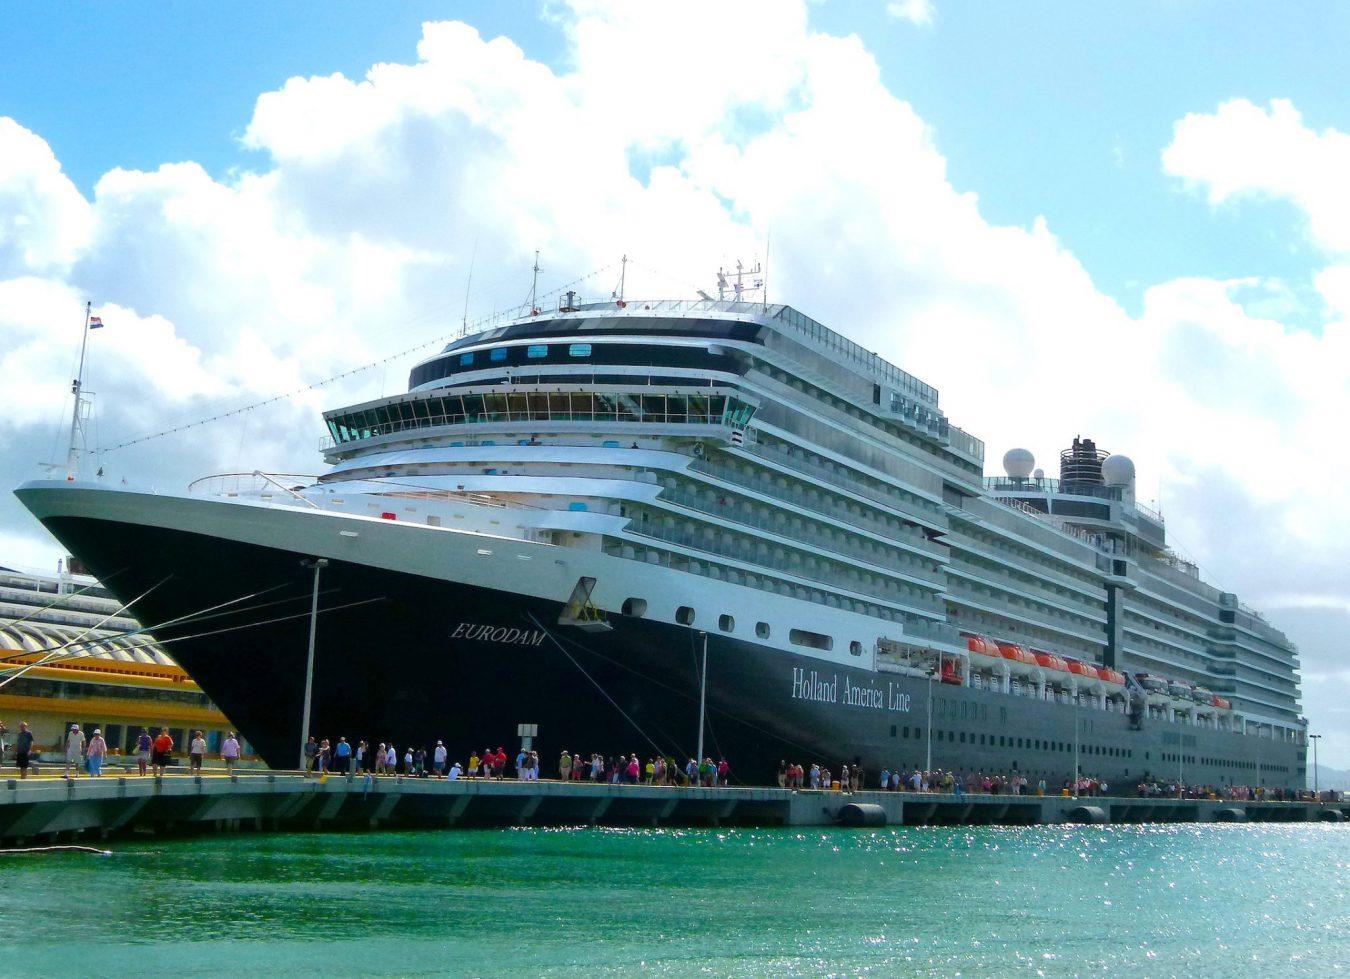 Cruising The Caribbean On The Eurodam AllThingsCruise - Eurodam cruise ship